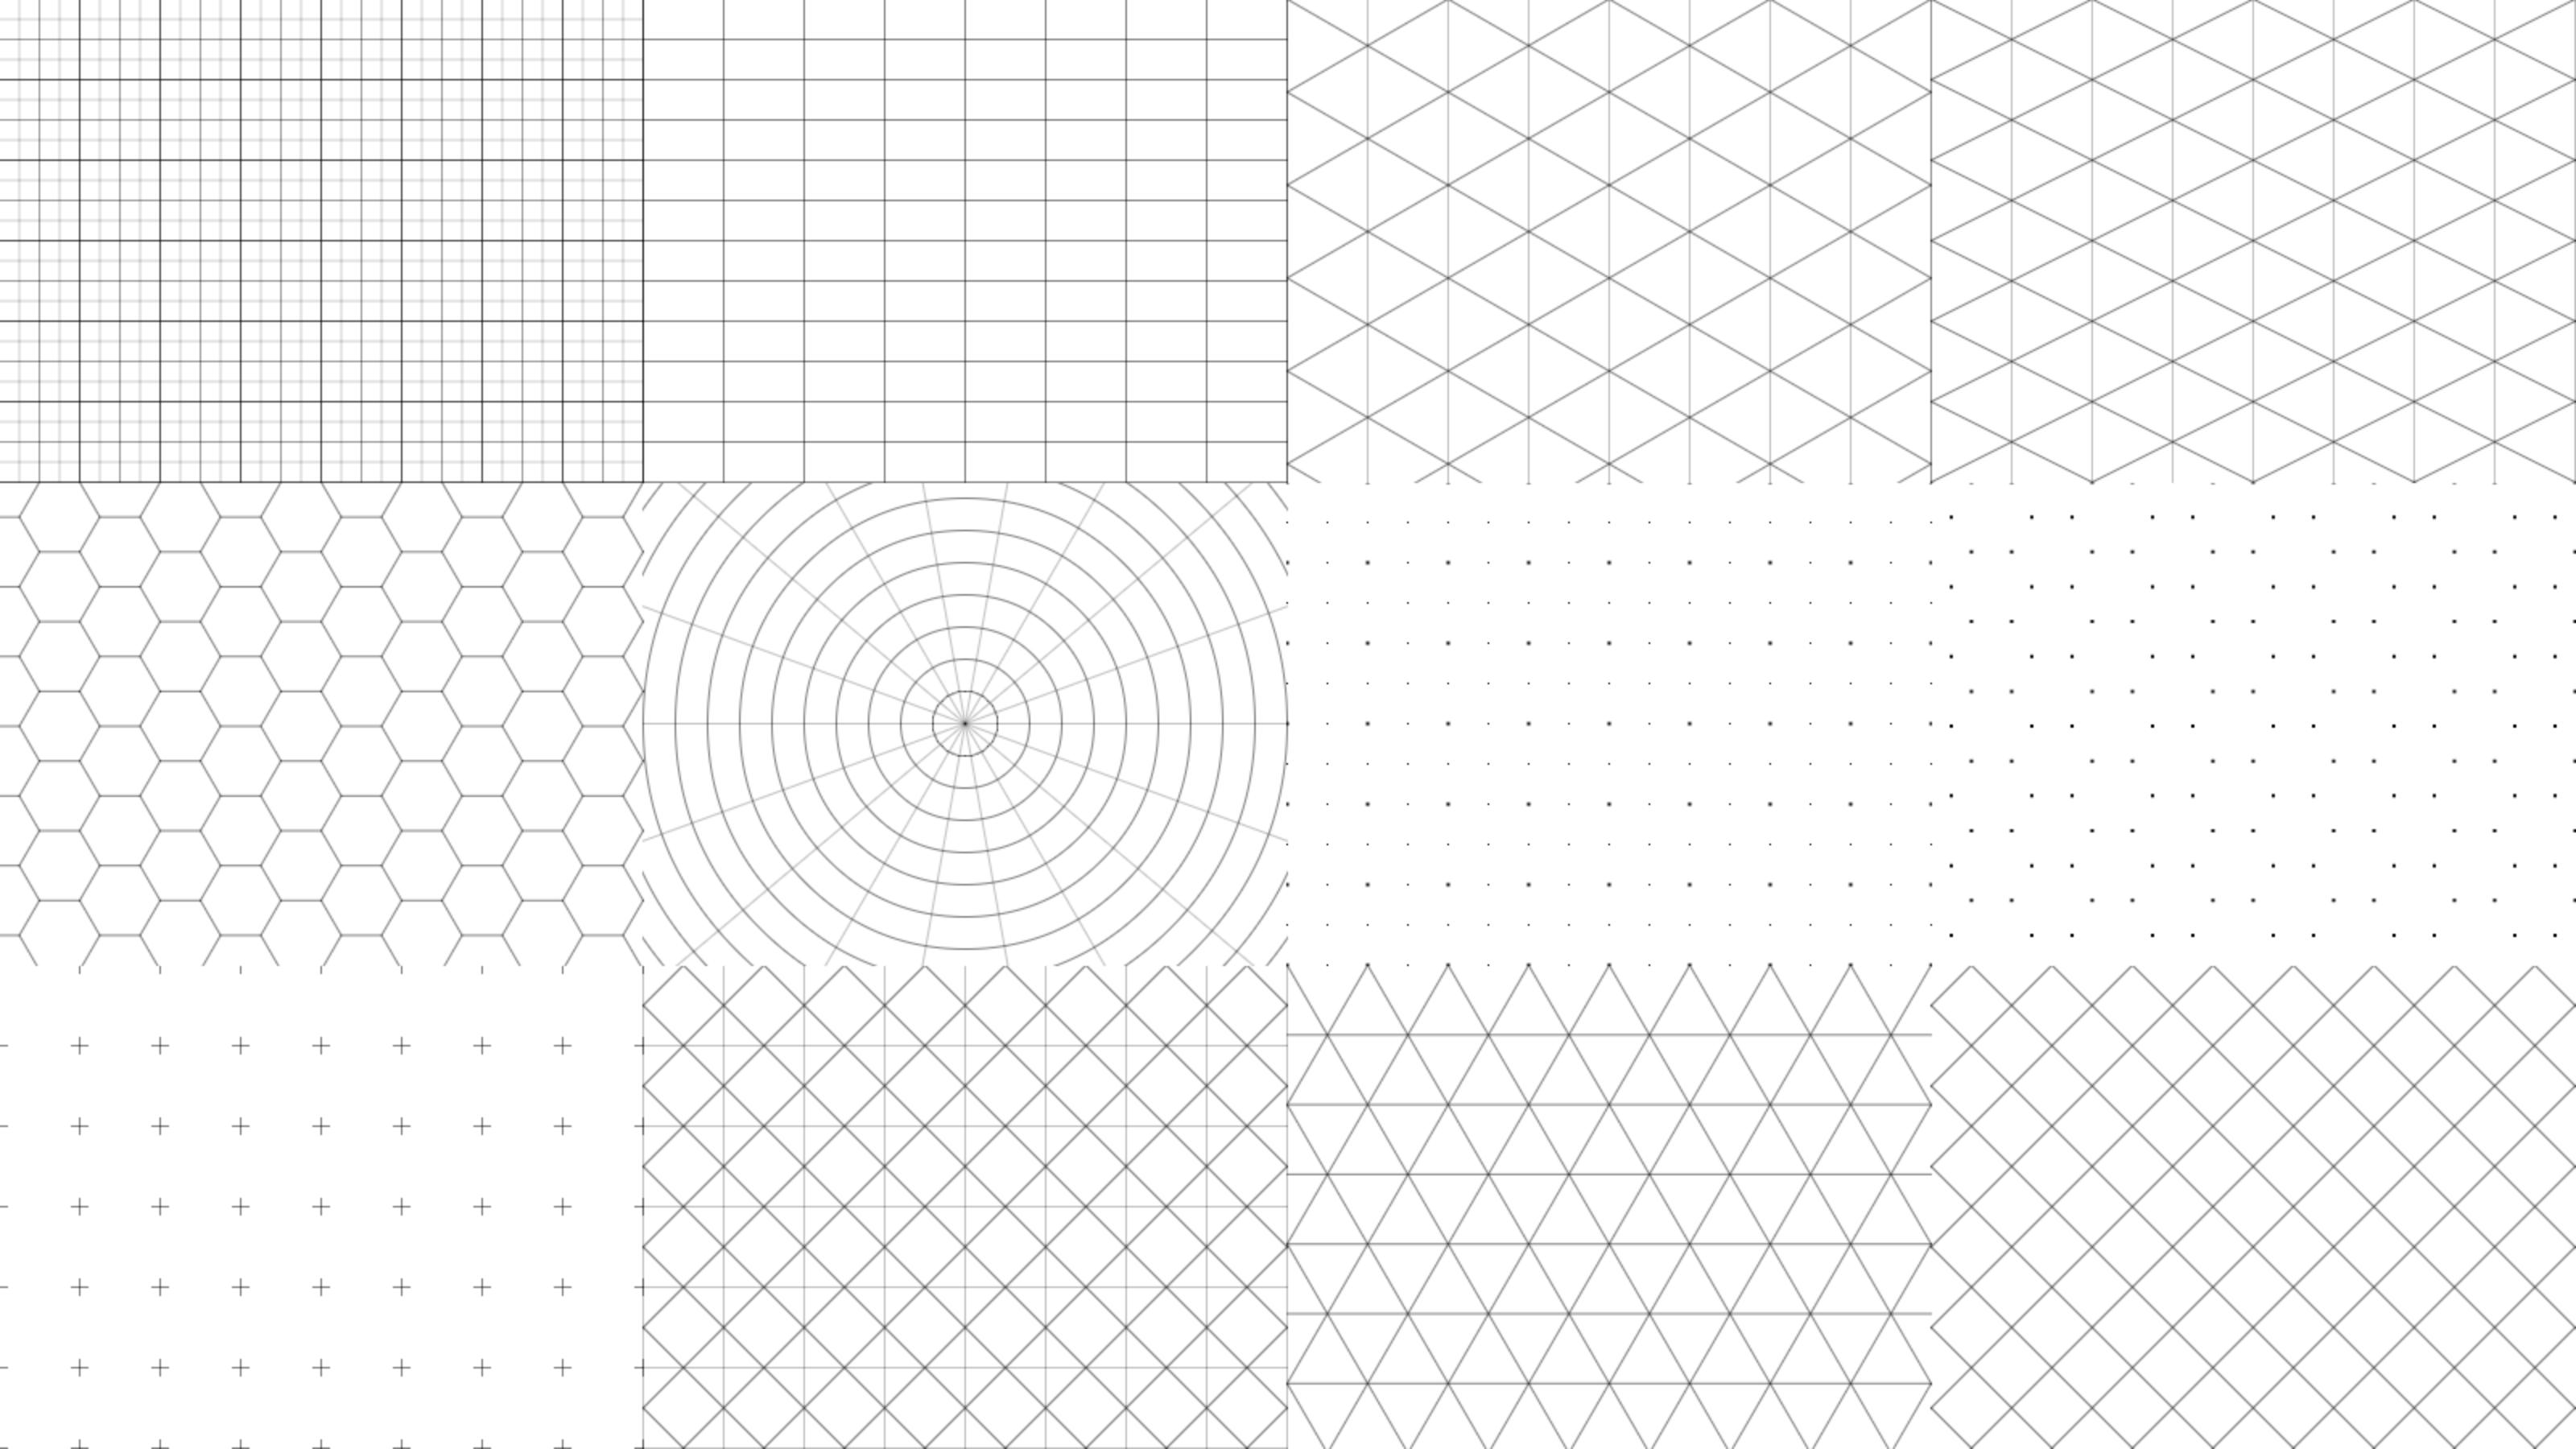 grid by bit101